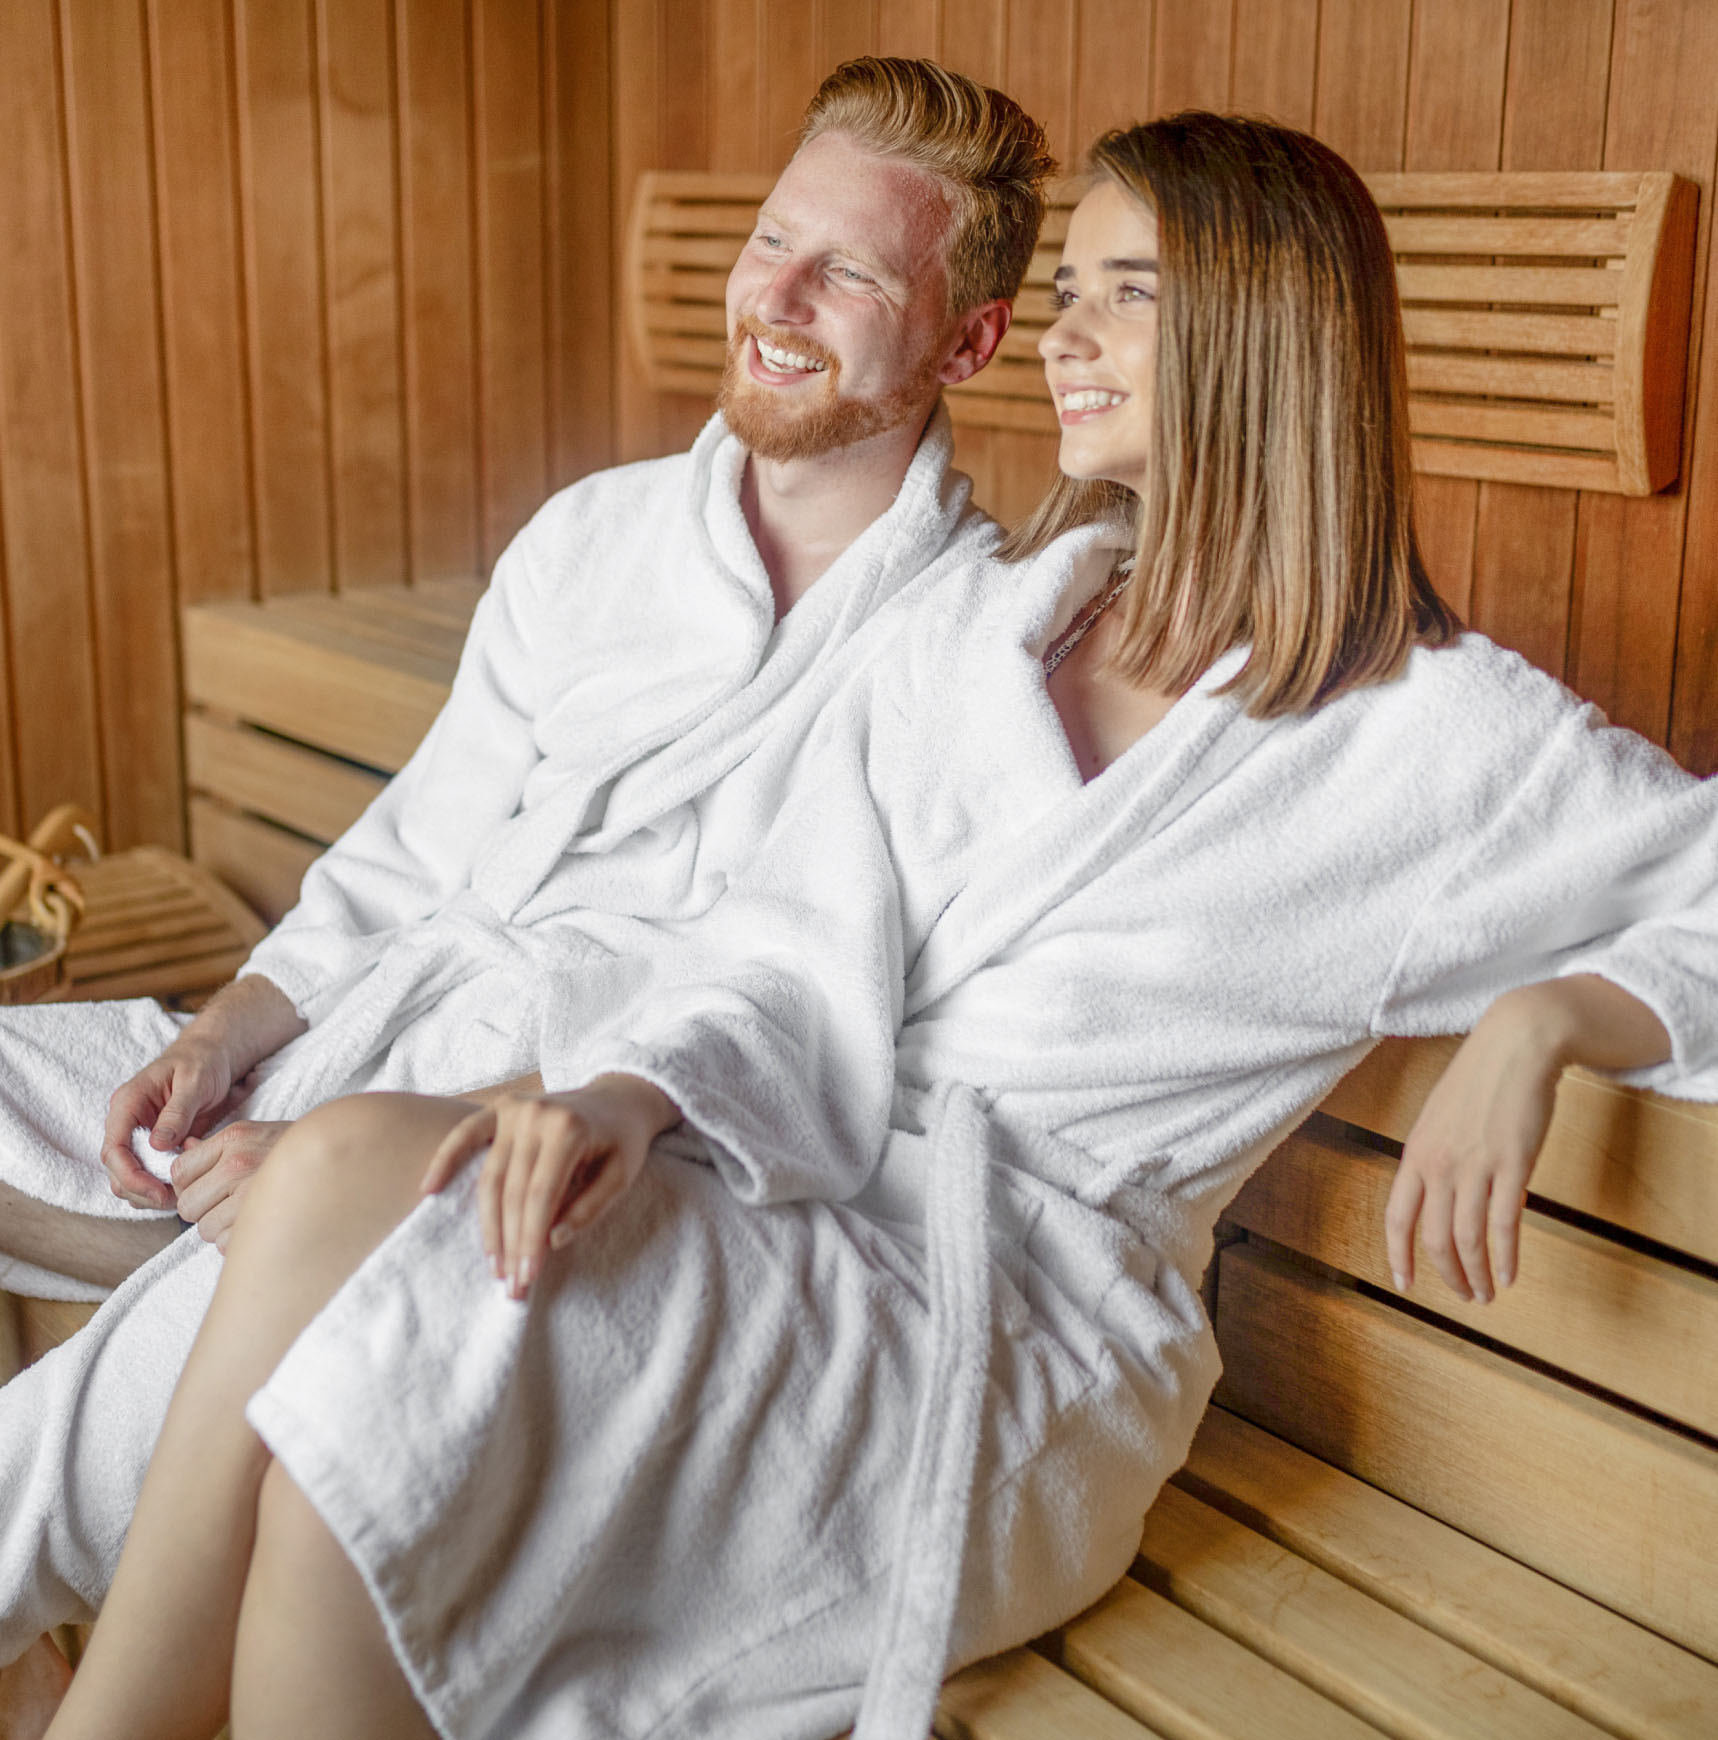 sauna1@2x.jpg